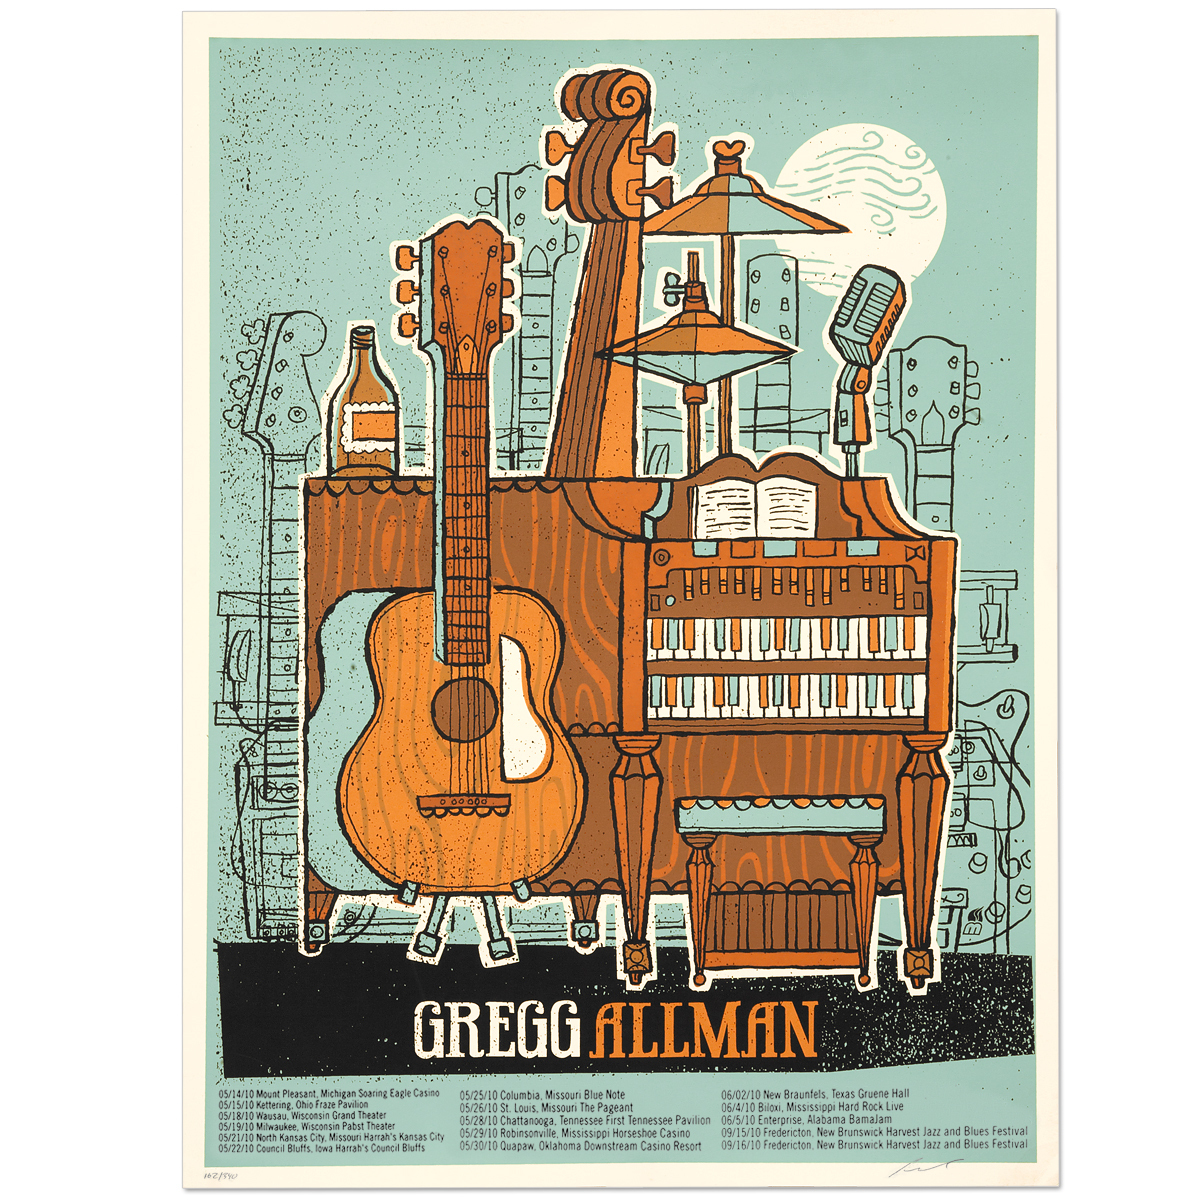 Gregg Allman 2010 Tour Poster